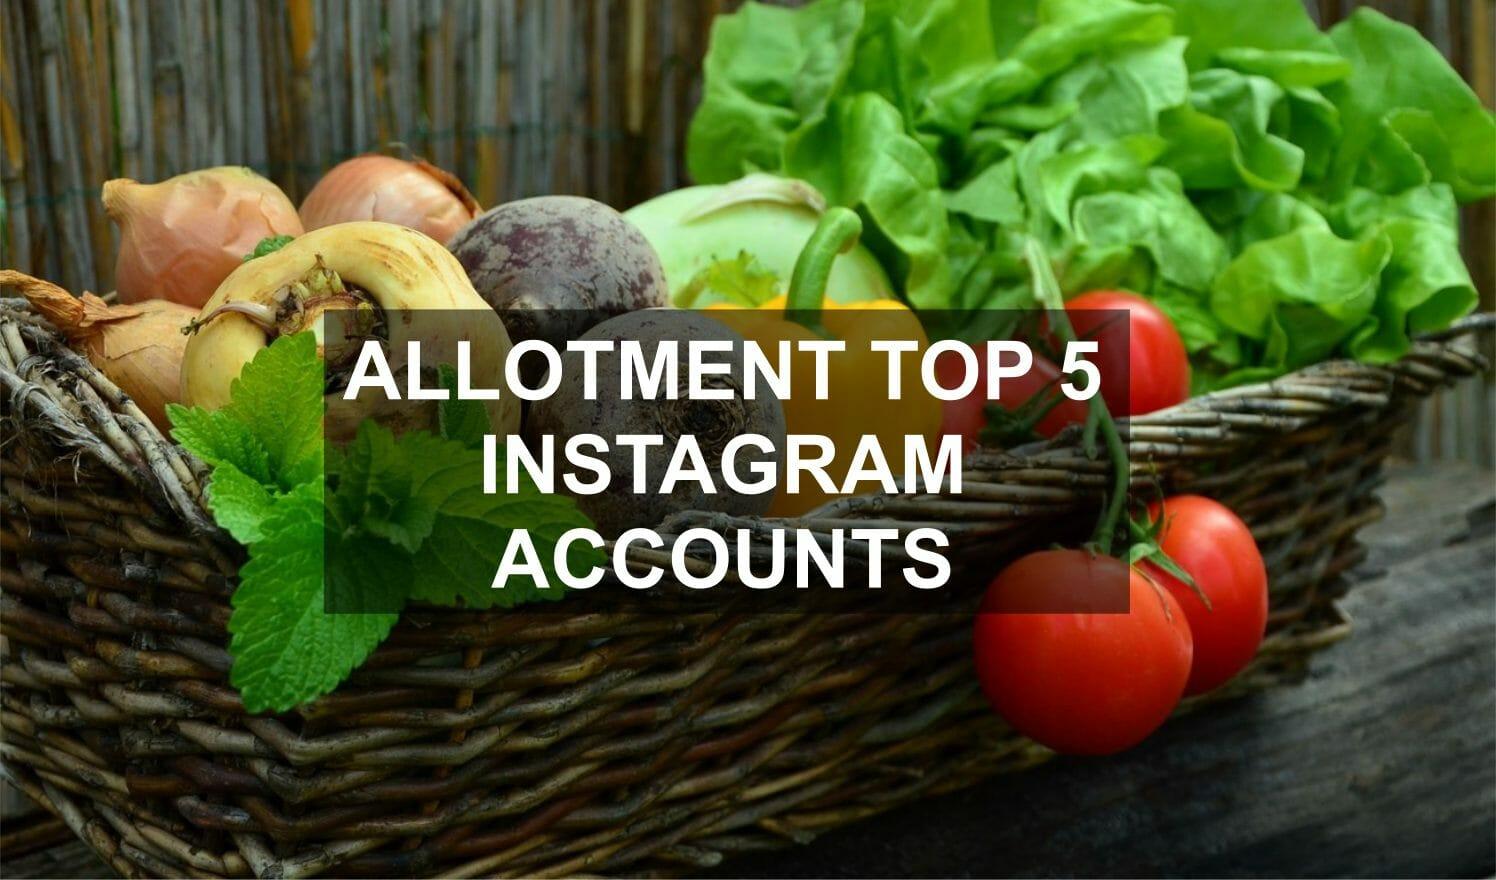 Allotment Top 5 Instagram